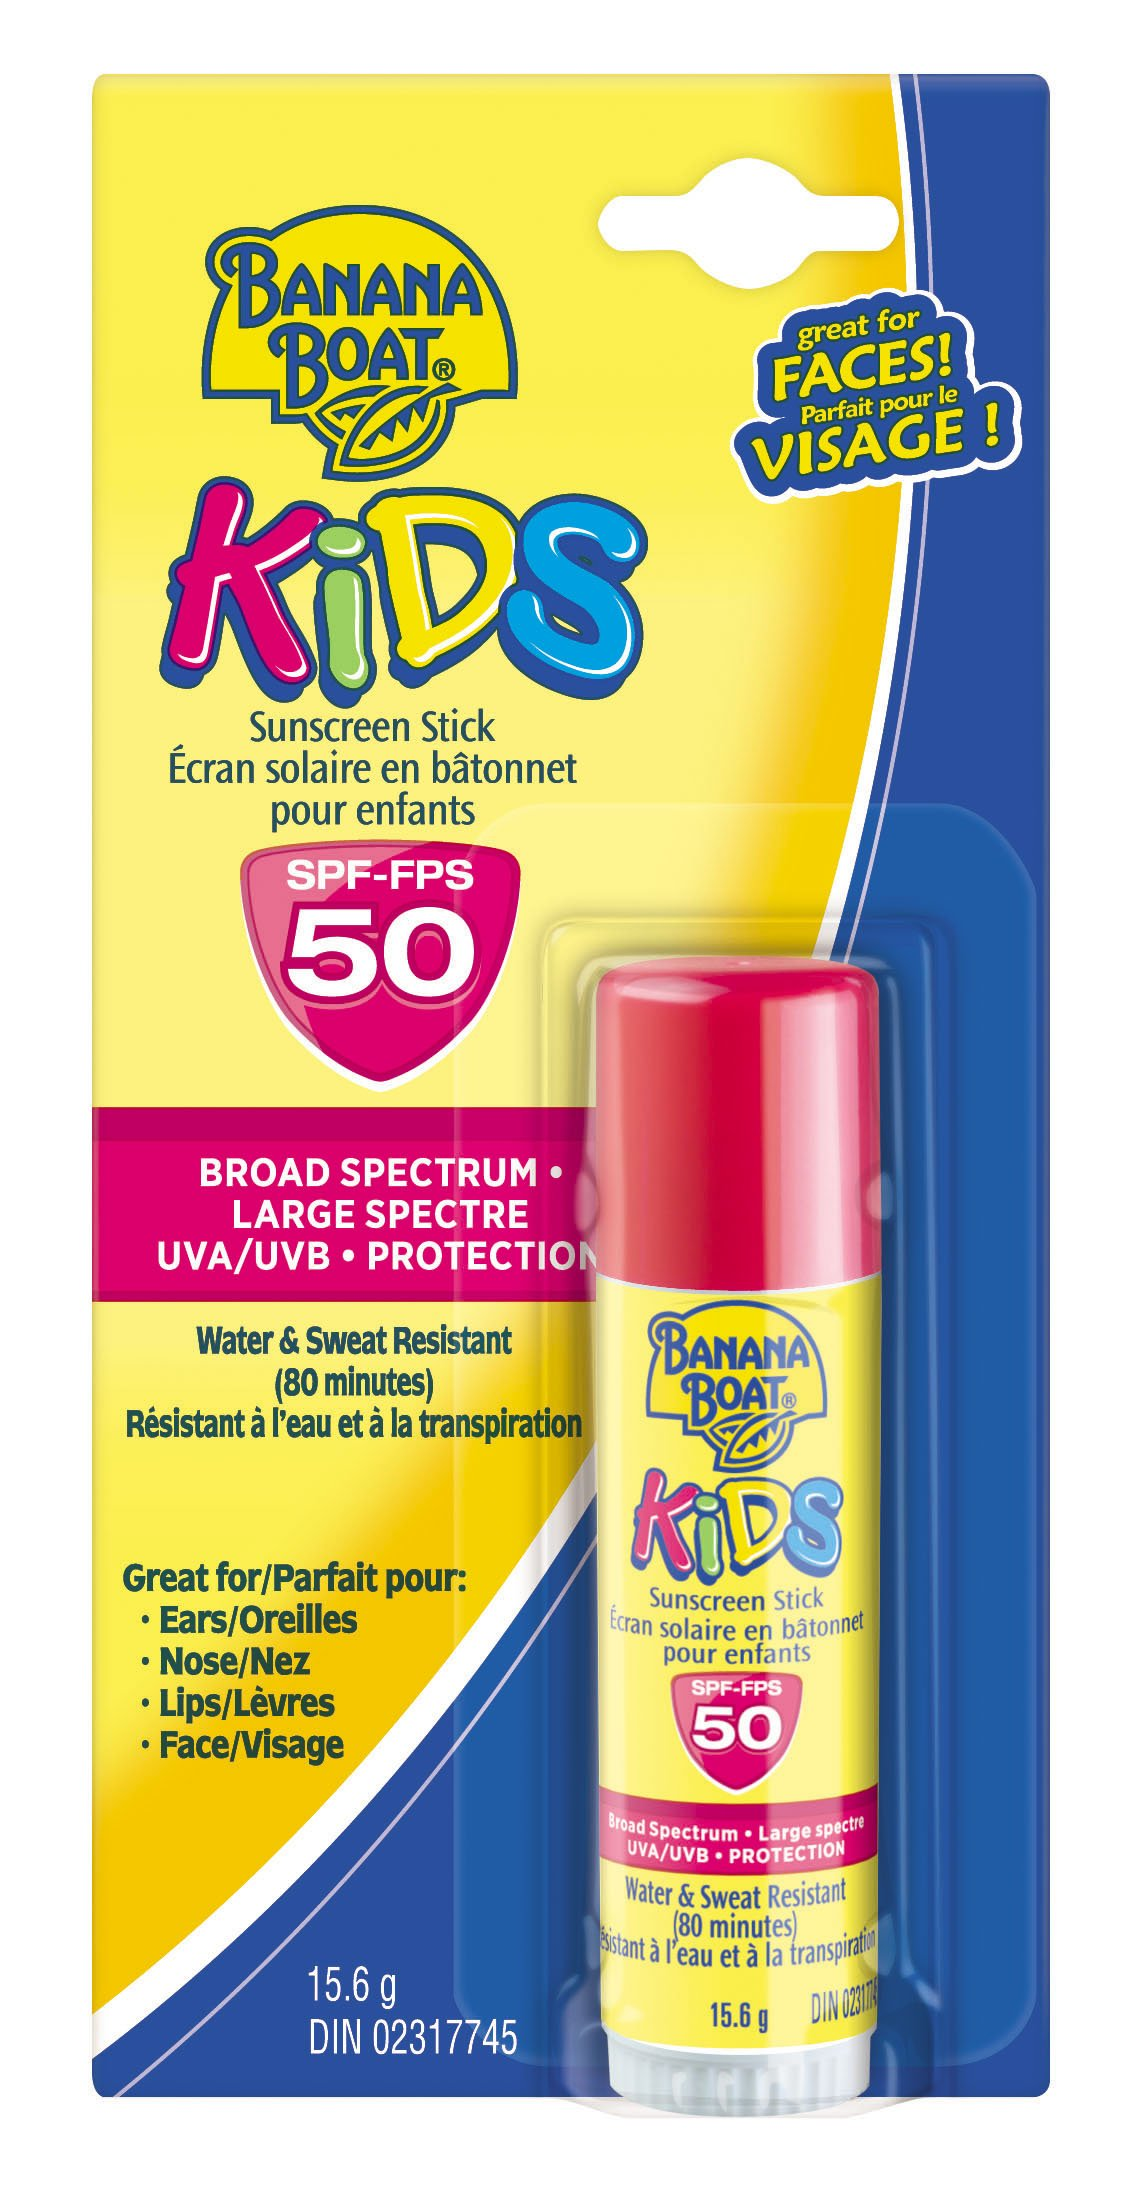 Banana Boat Sunscreen Kids Broad Spectrum Sun Care Sunscreen Stick - SPF 50 (Pack of 4)